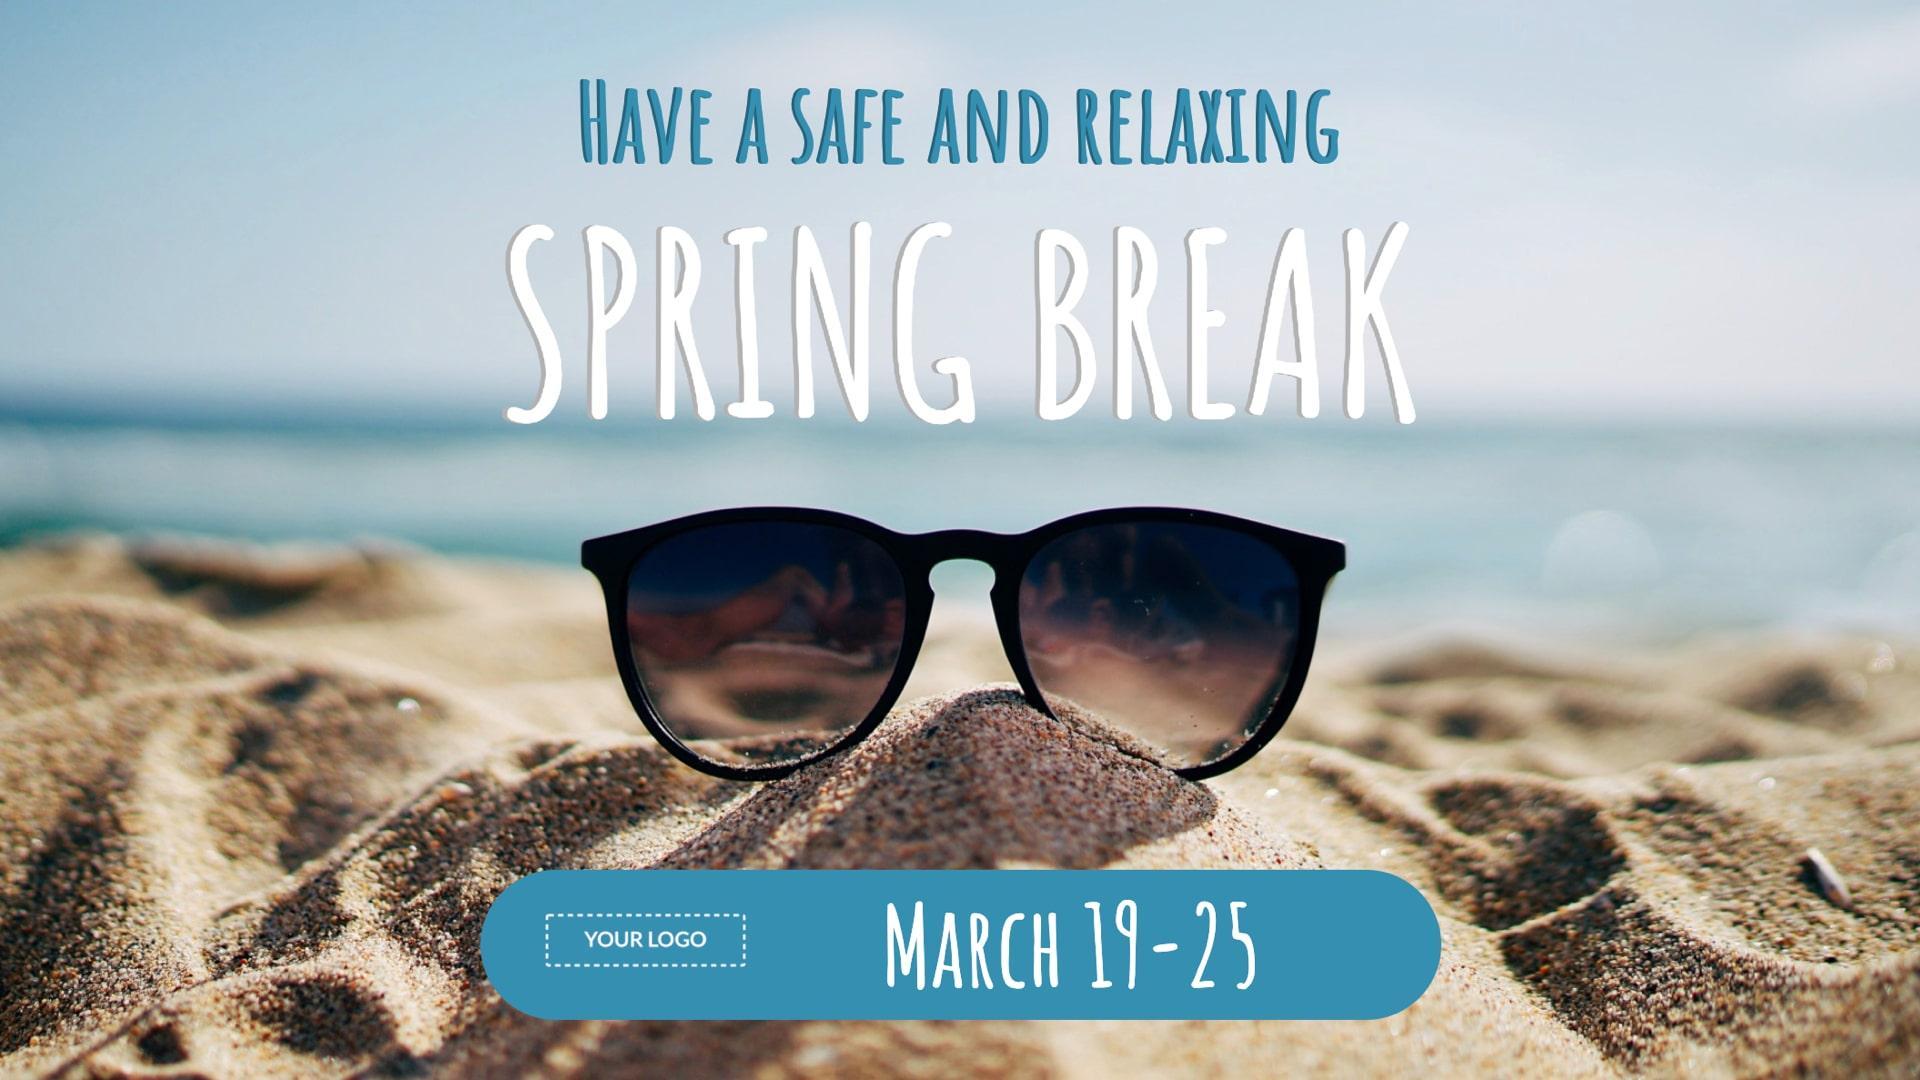 Spring Break Digital Signage Template